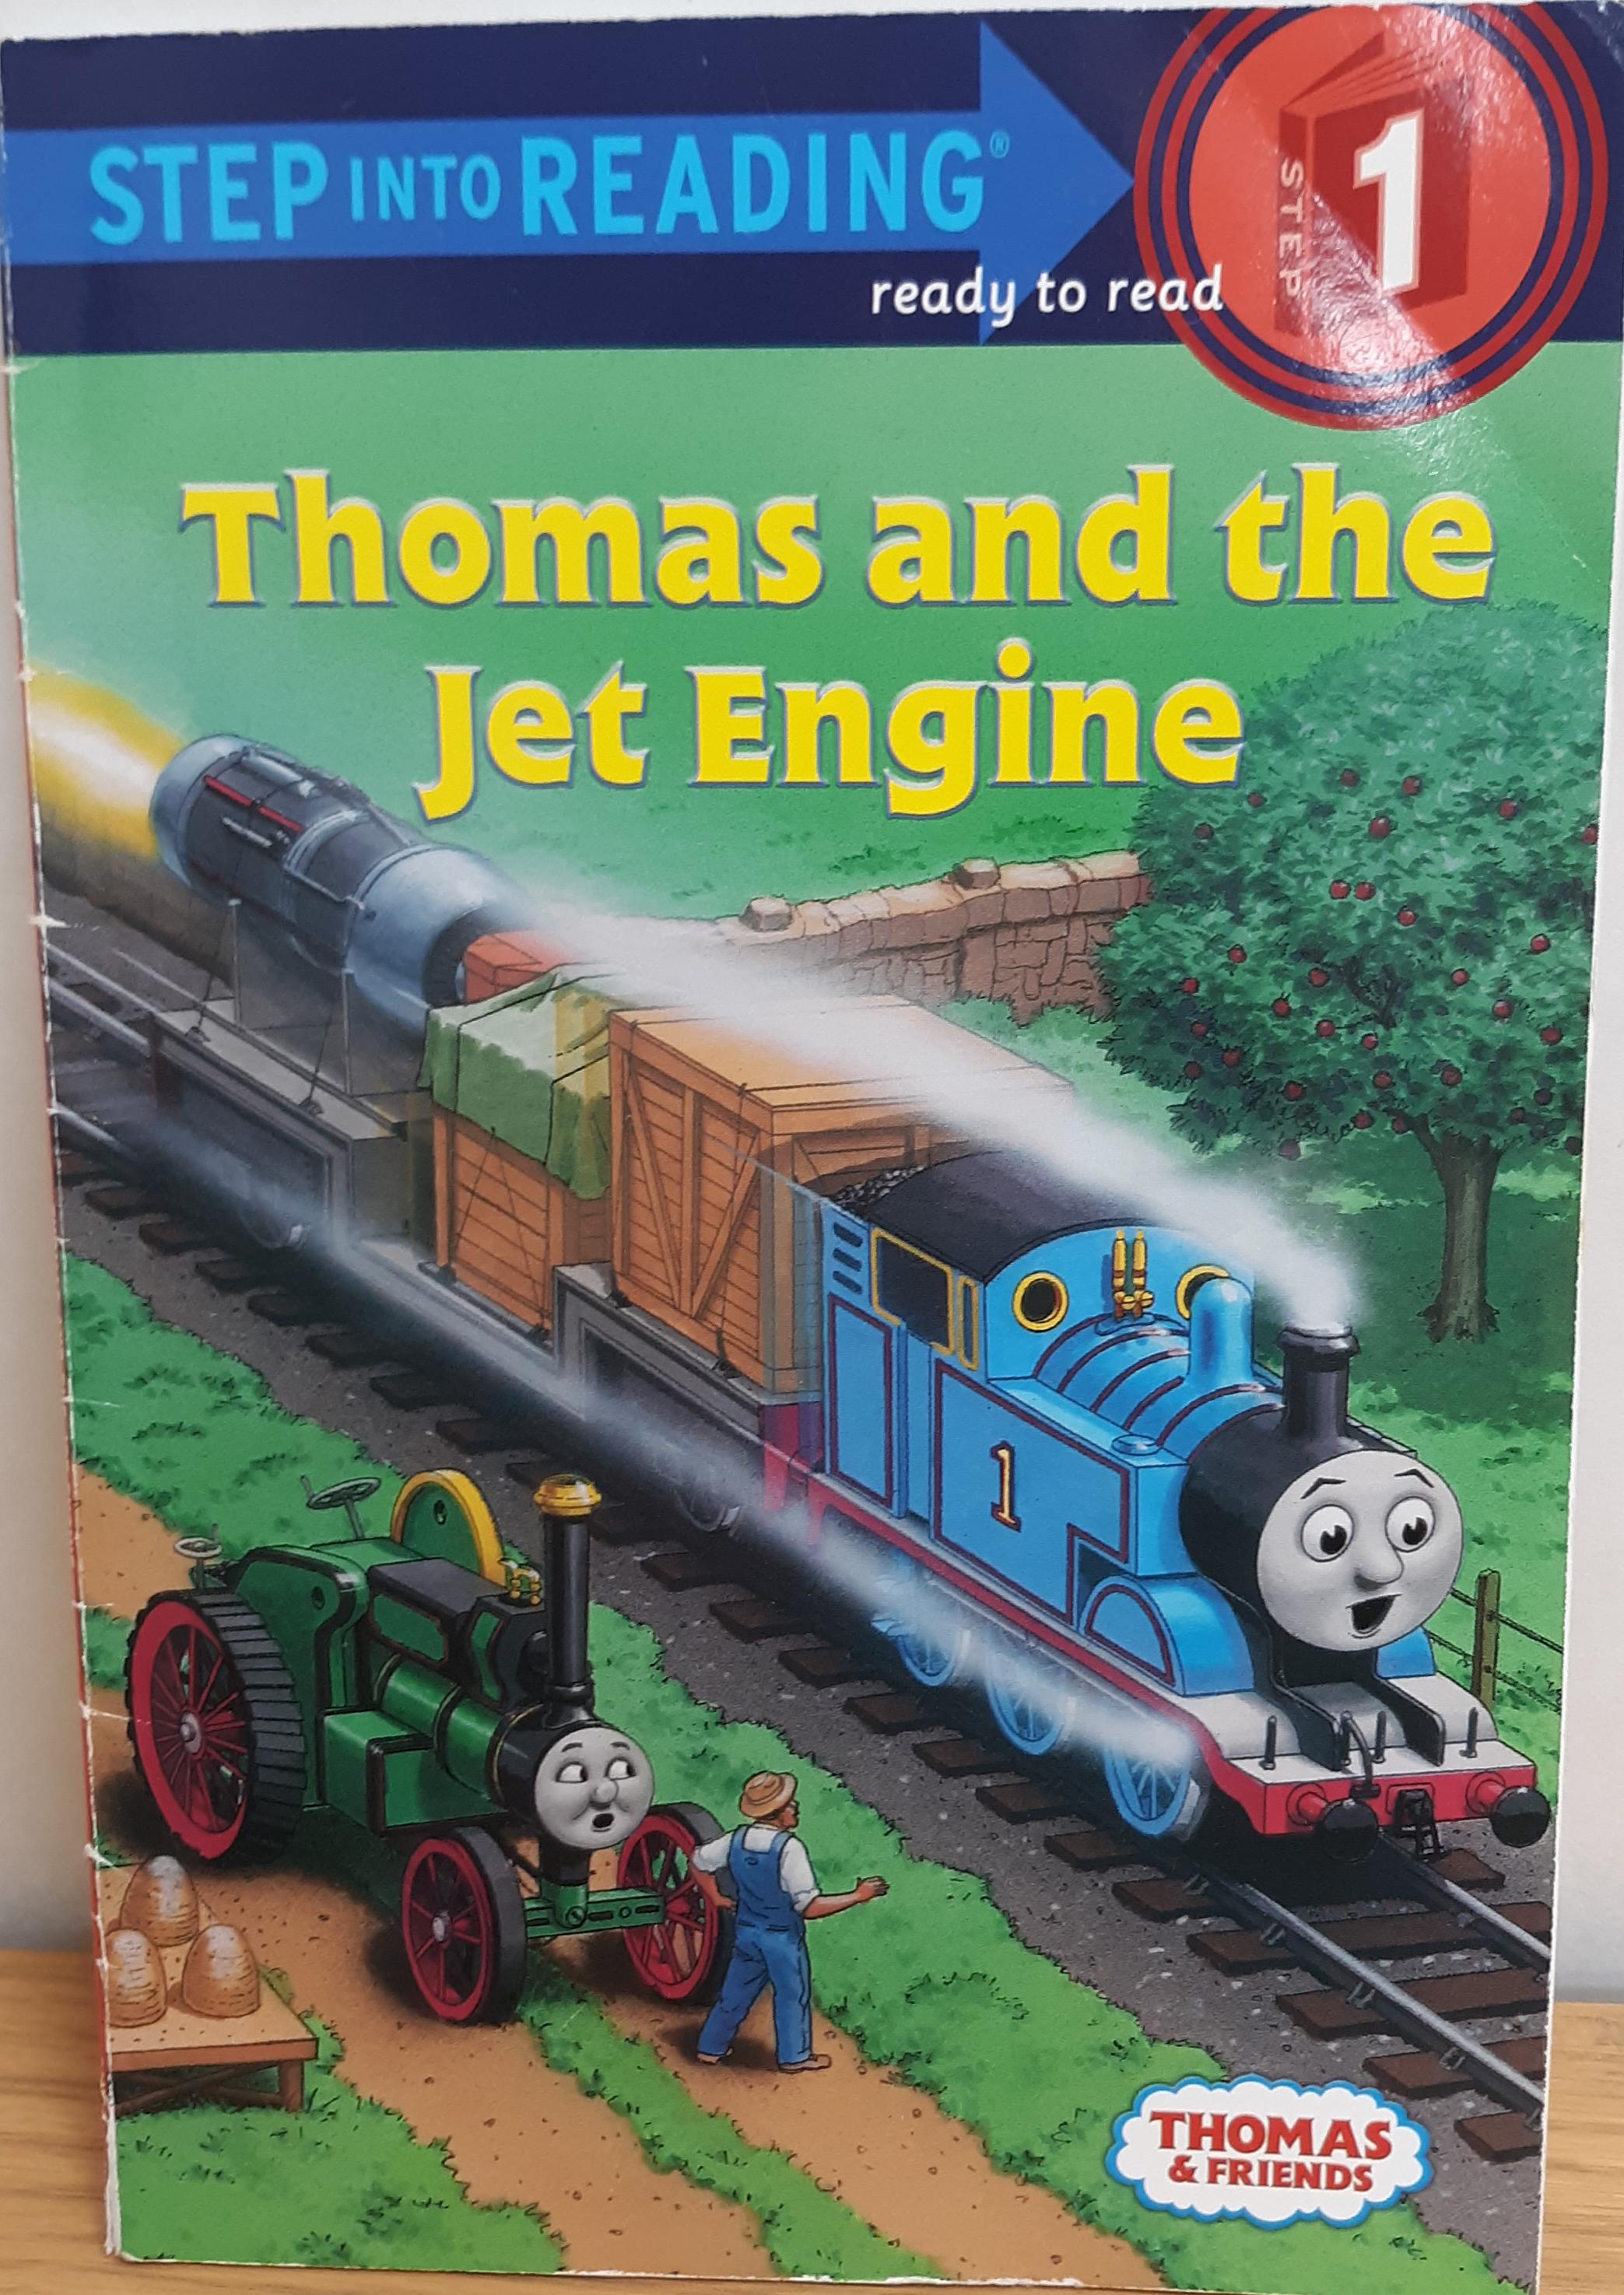 https://0201.nccdn.net/1_2/000/000/0e6/6e2/thomas---friends--thomas-and-the-jet-engine.png